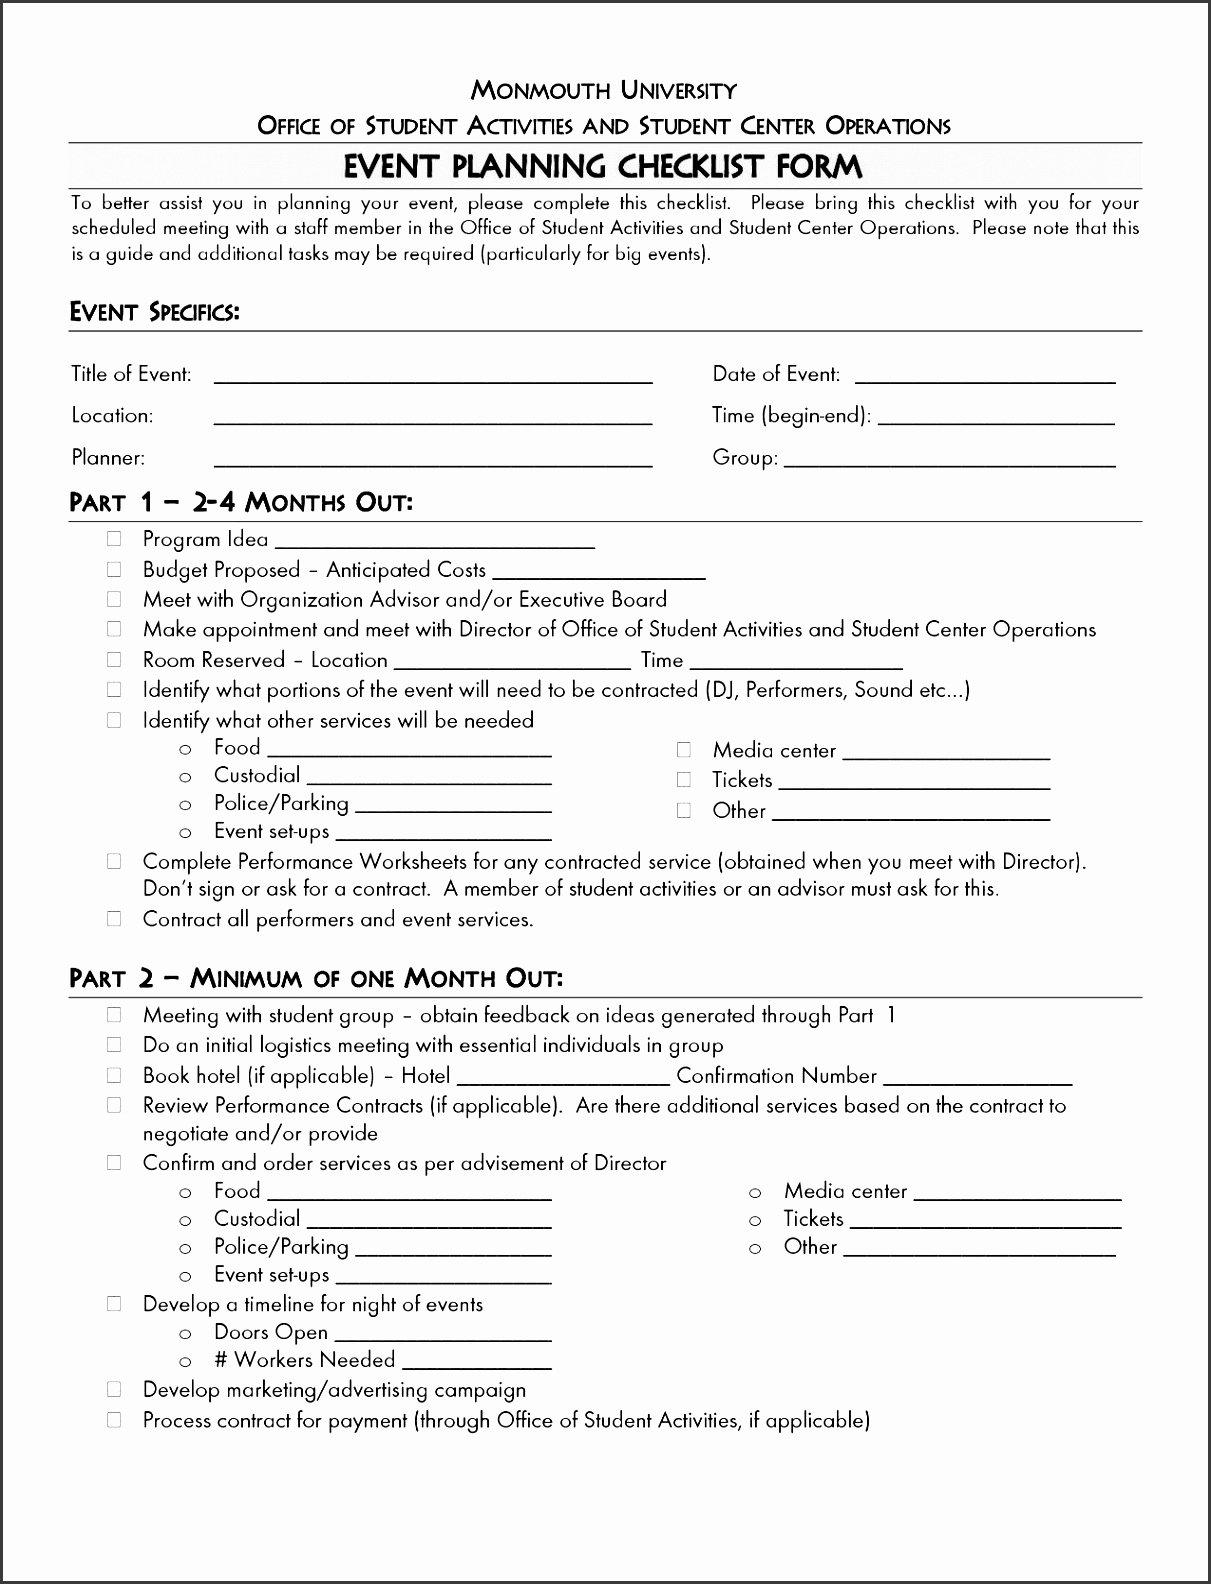 Church event Planning Checklist Awesome 5 Church event Planning Checklist Outline Sampletemplatess Sampletemplatess